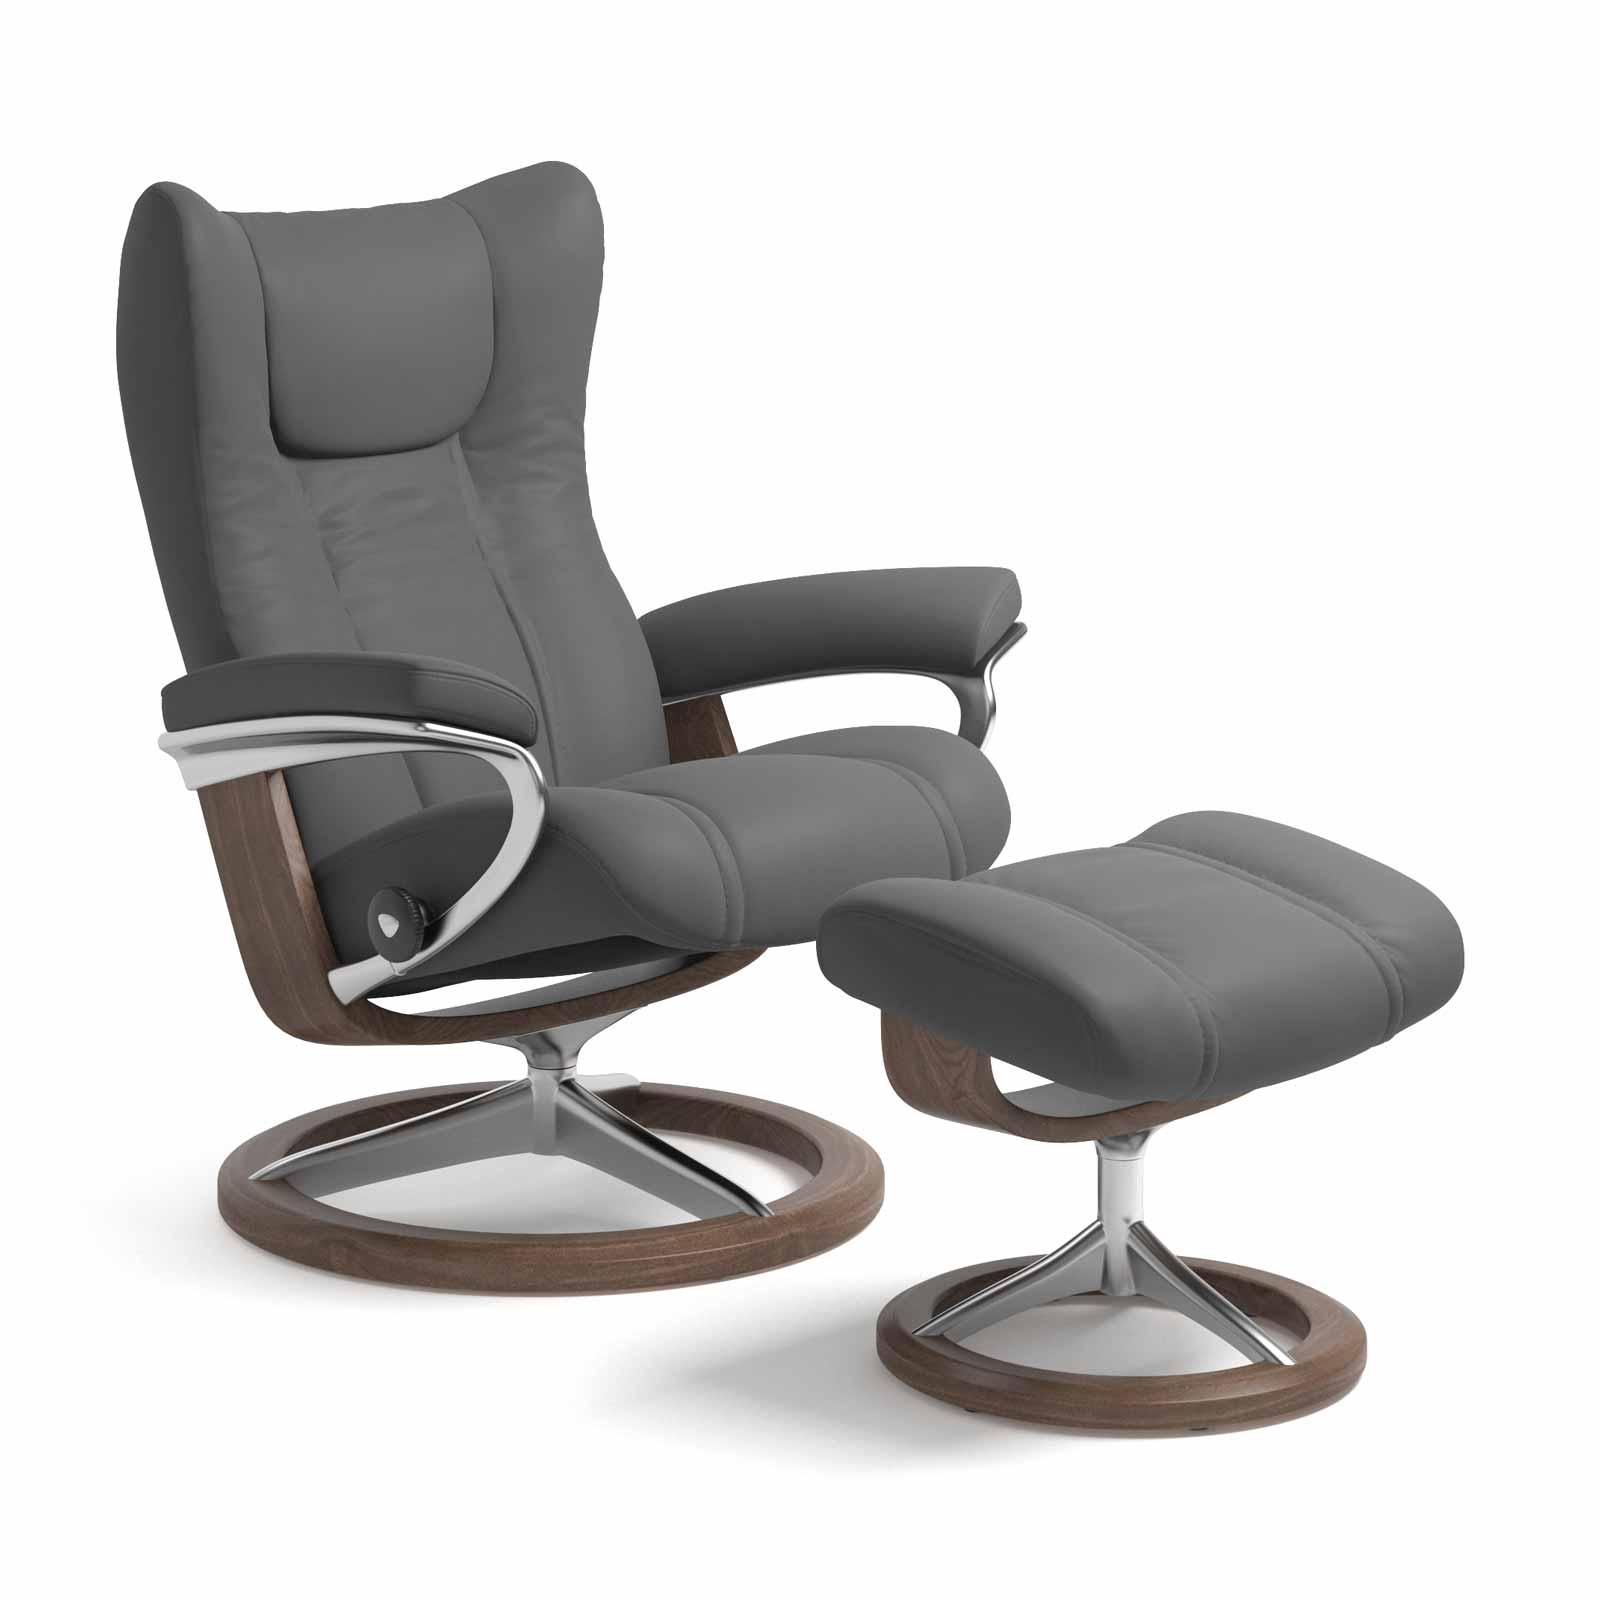 stressless sessel wing signature batick grau mit hocker. Black Bedroom Furniture Sets. Home Design Ideas